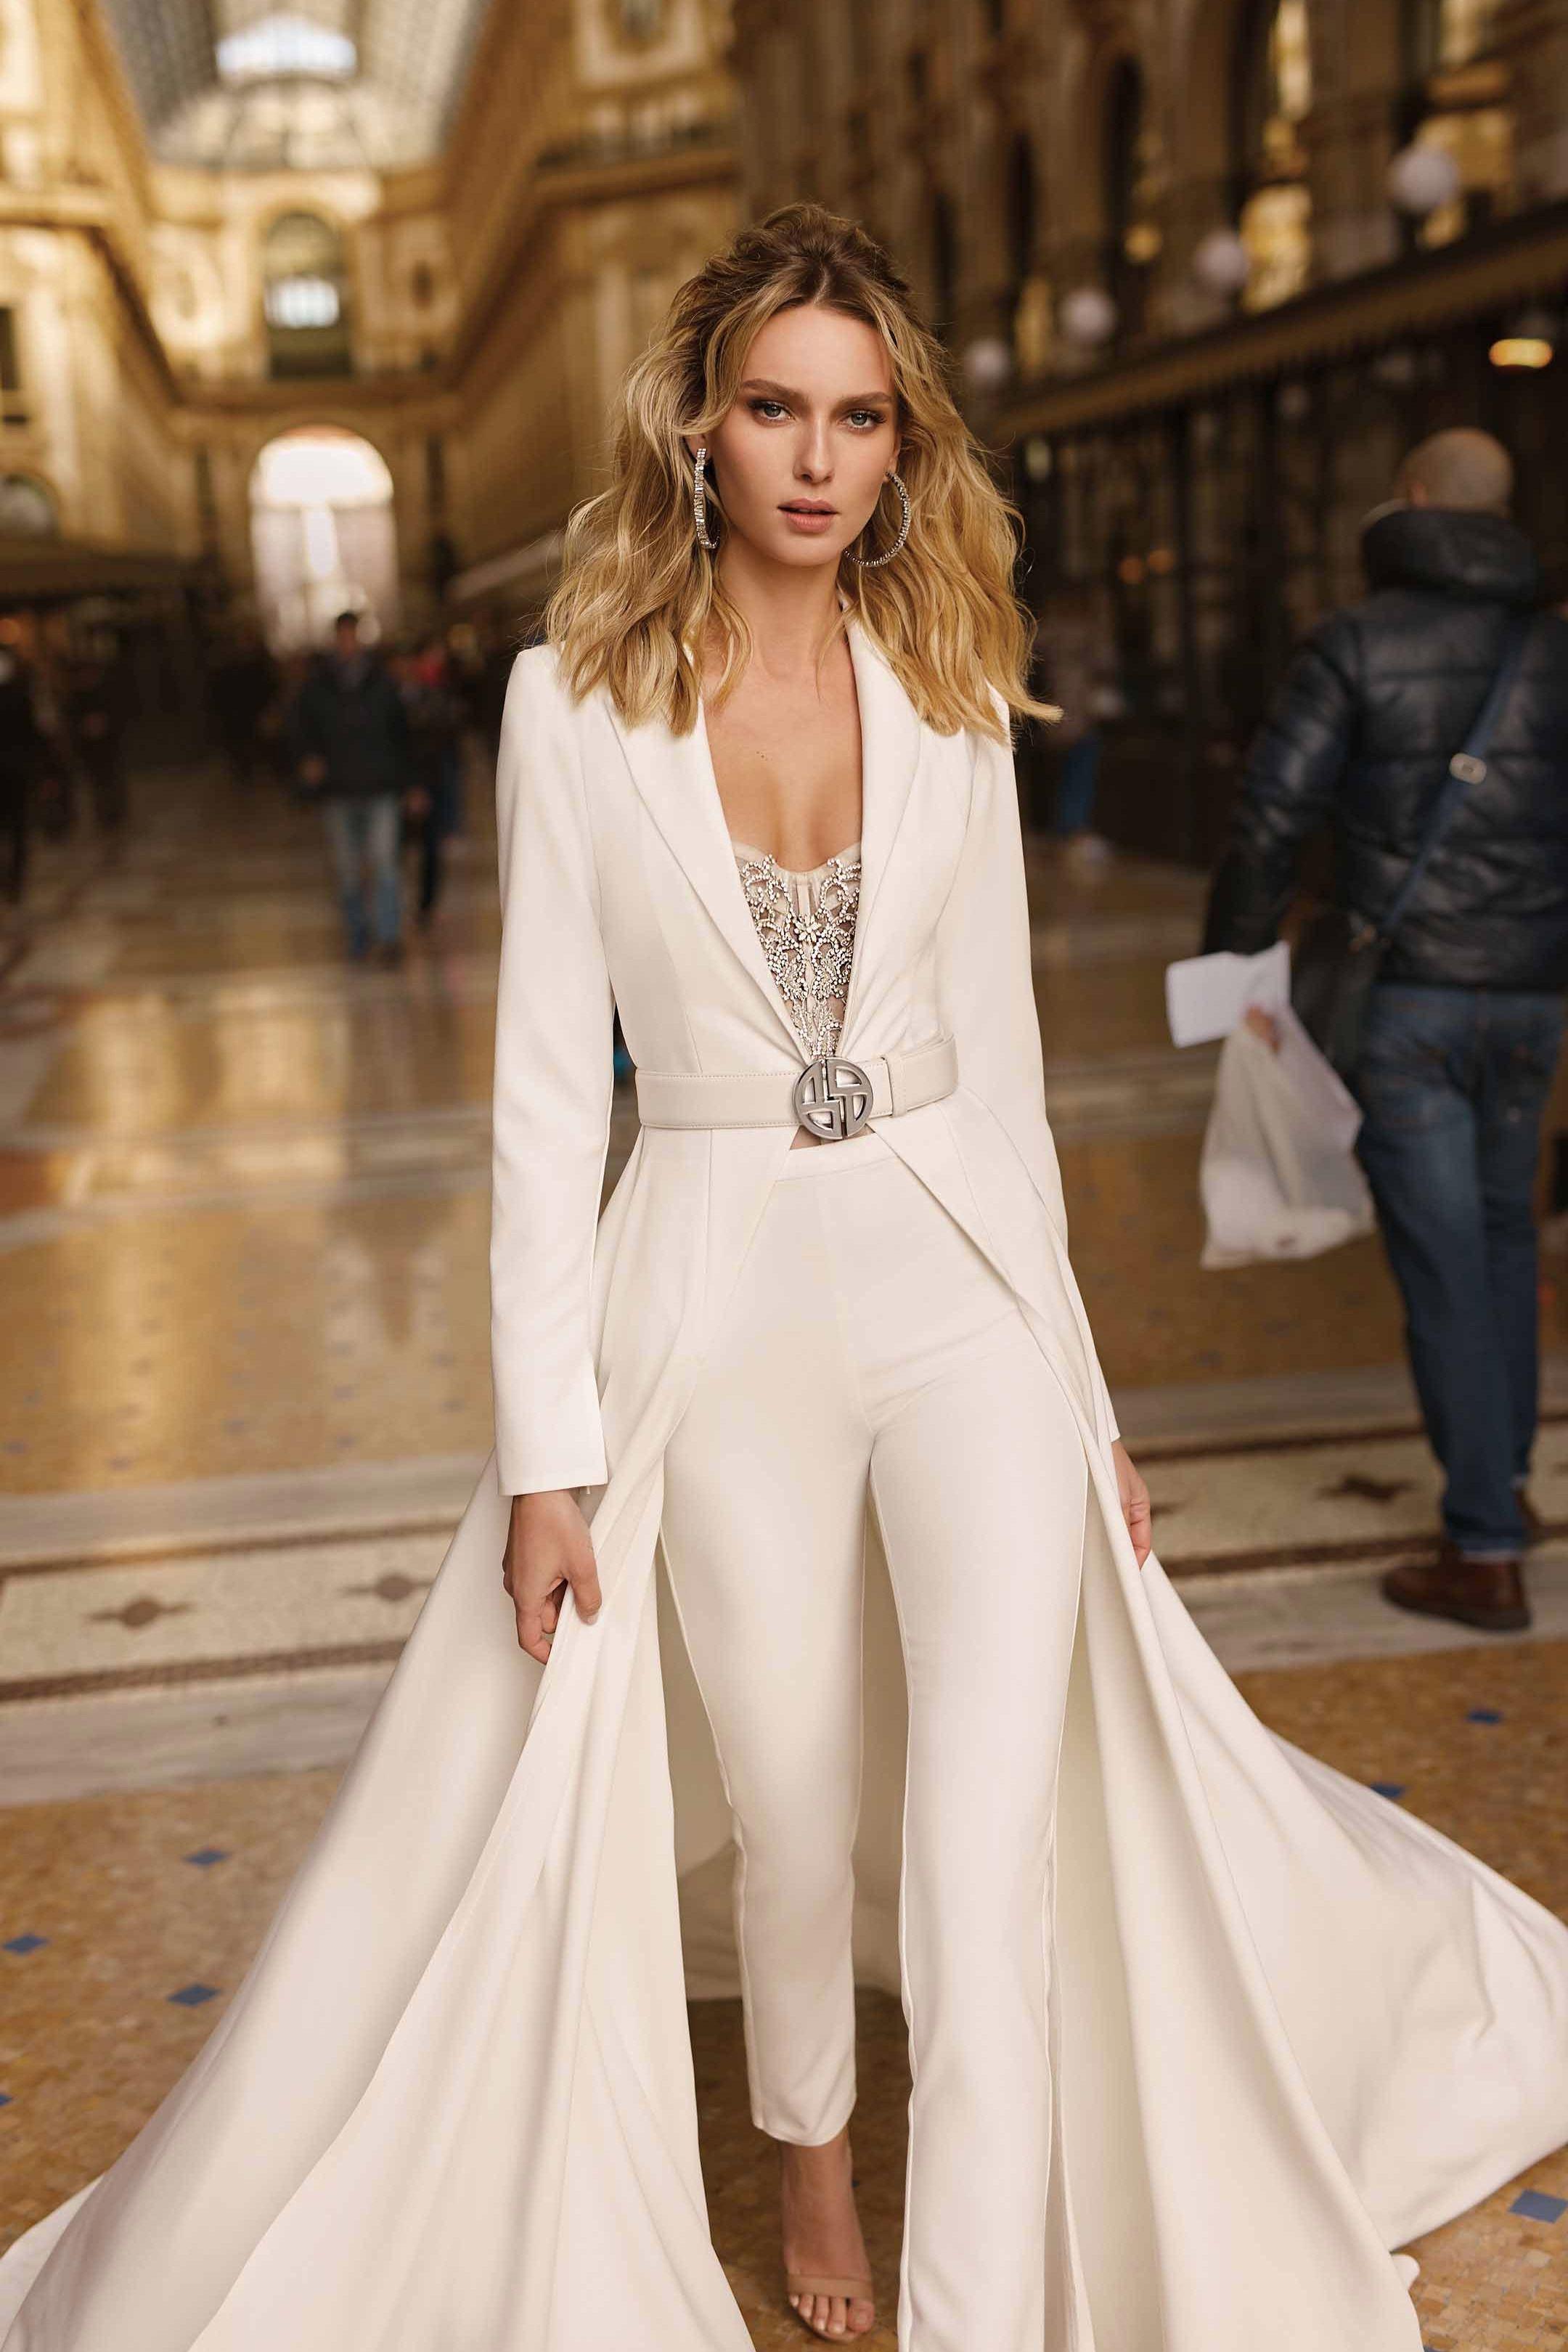 Berta Style 20-24 | Women suits wedding, Wedding dress